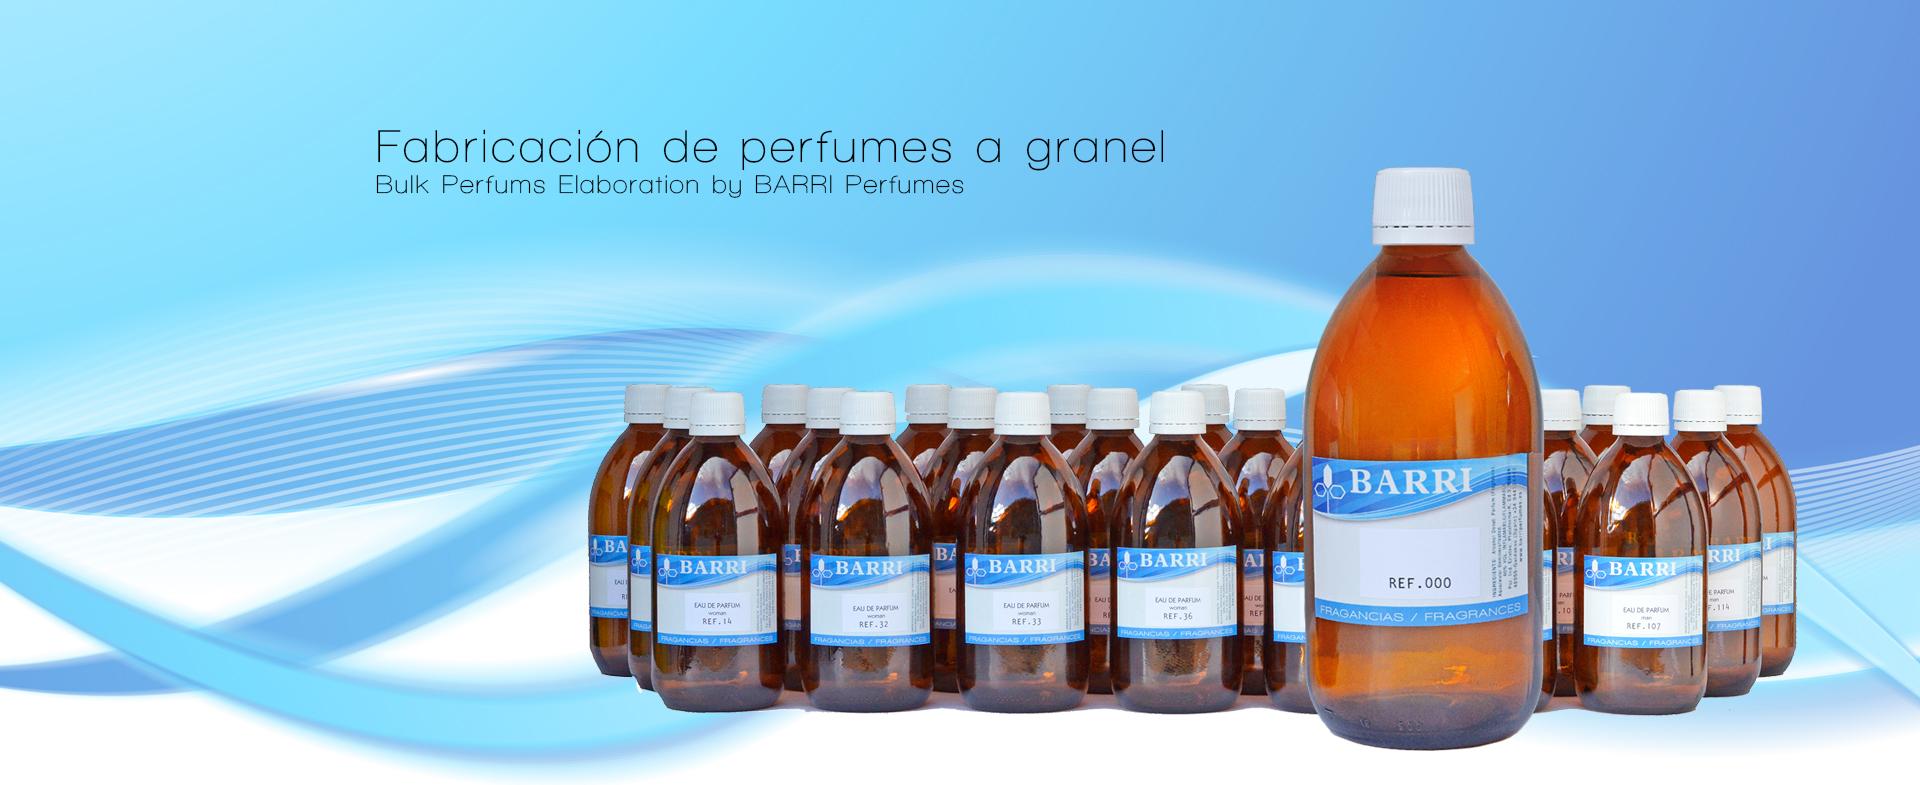 Fabricacion perfumes a granel